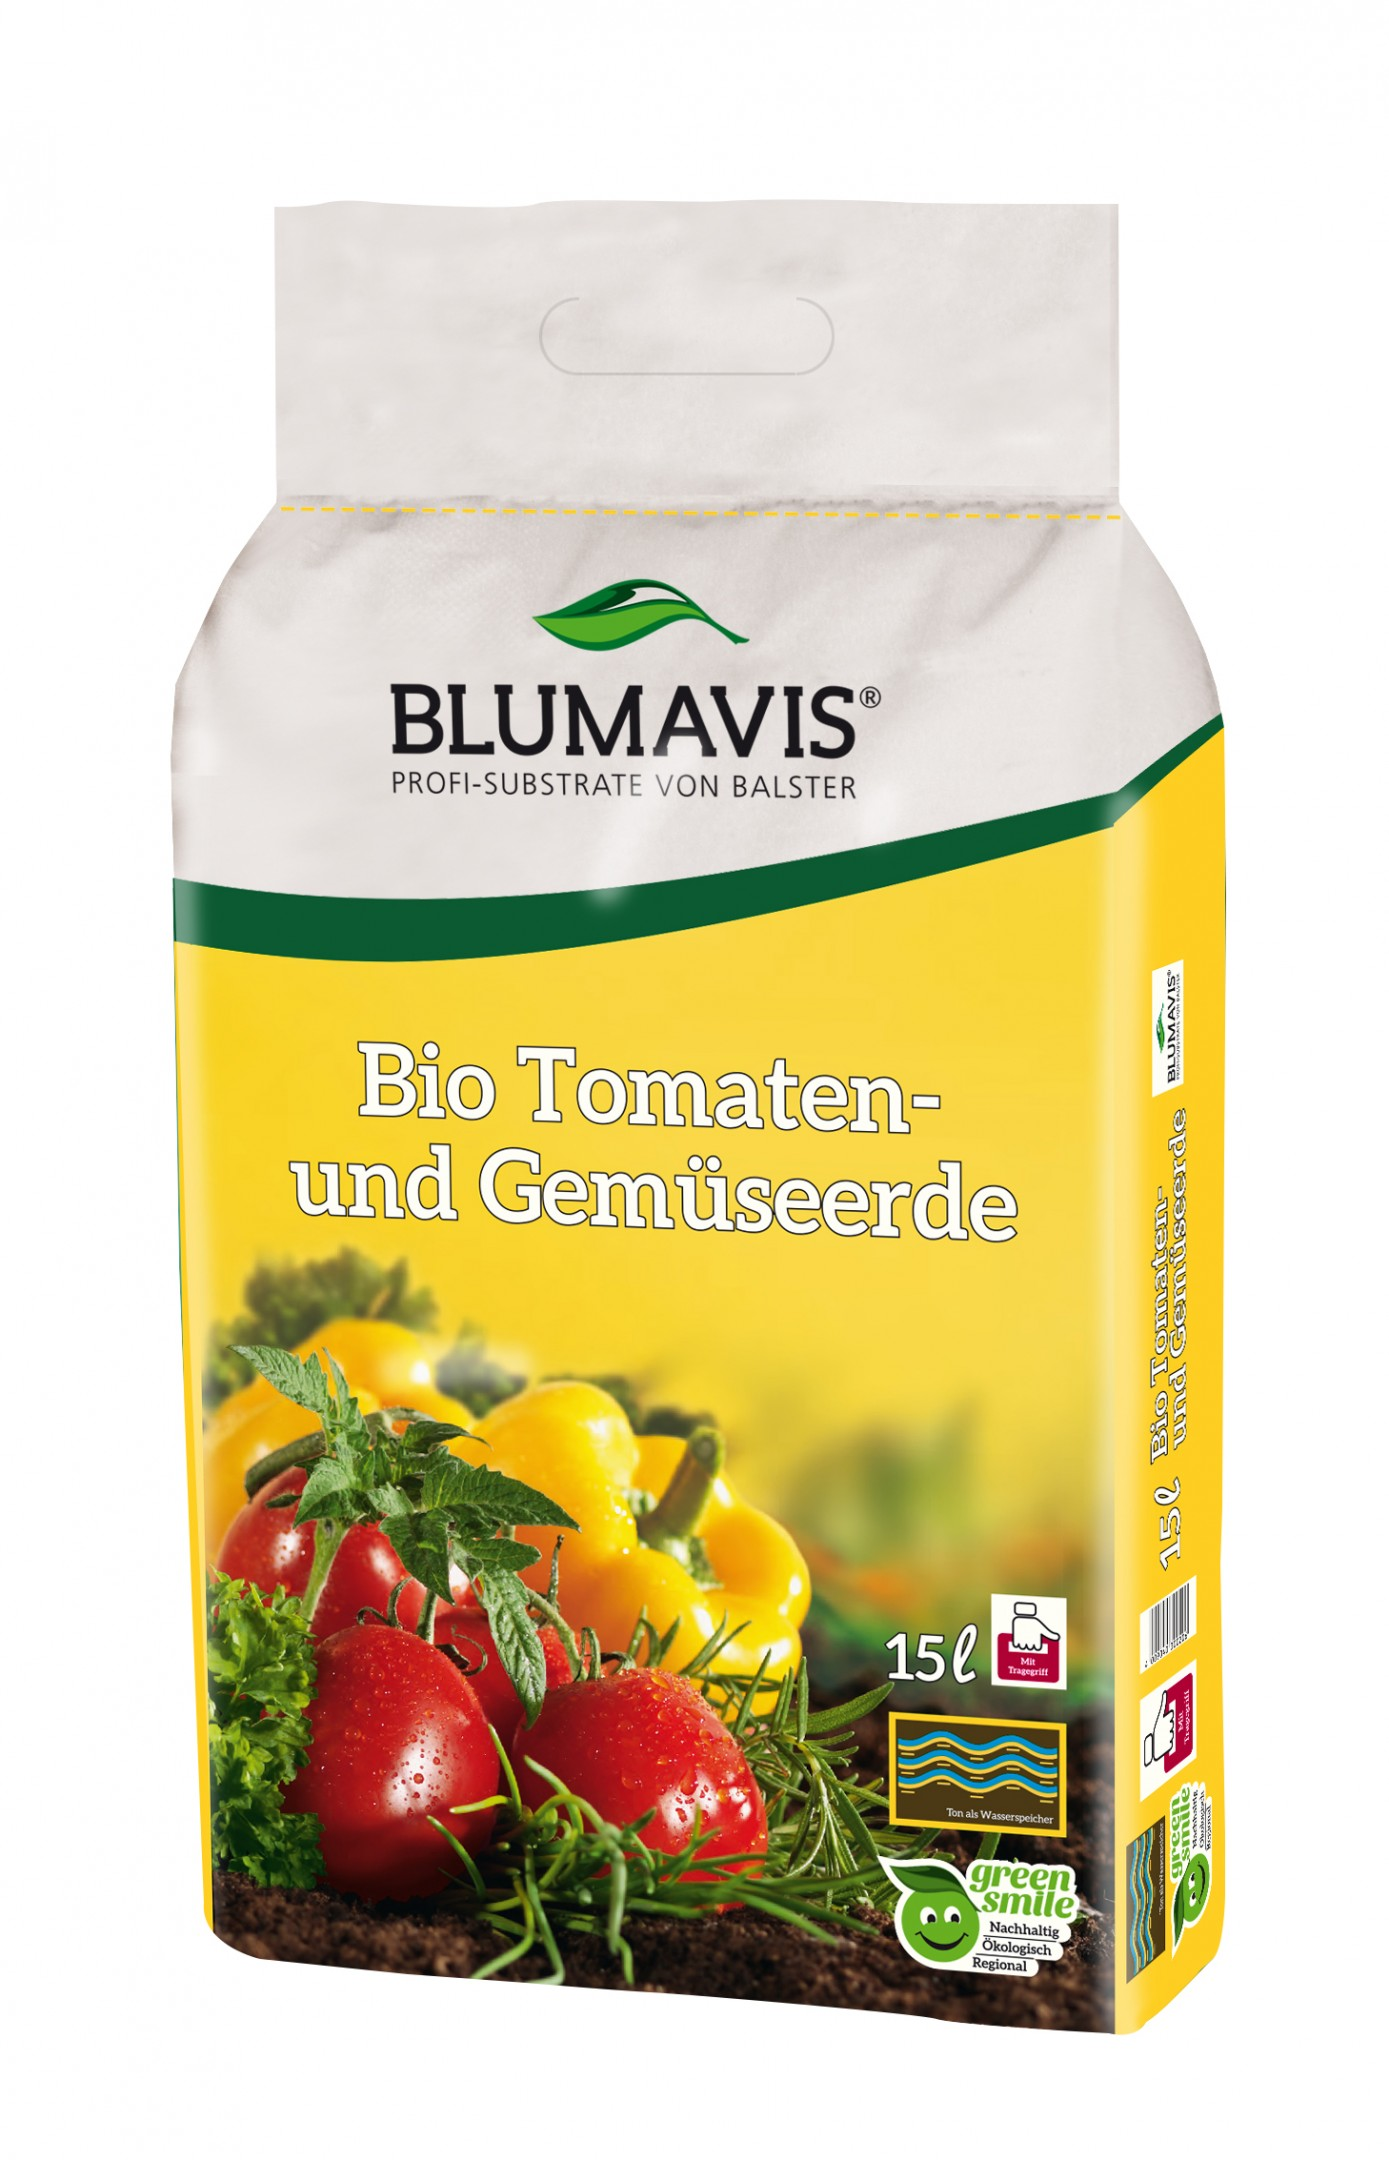 Bio Tomaten- & Gemüseerde torffrei Bild 1